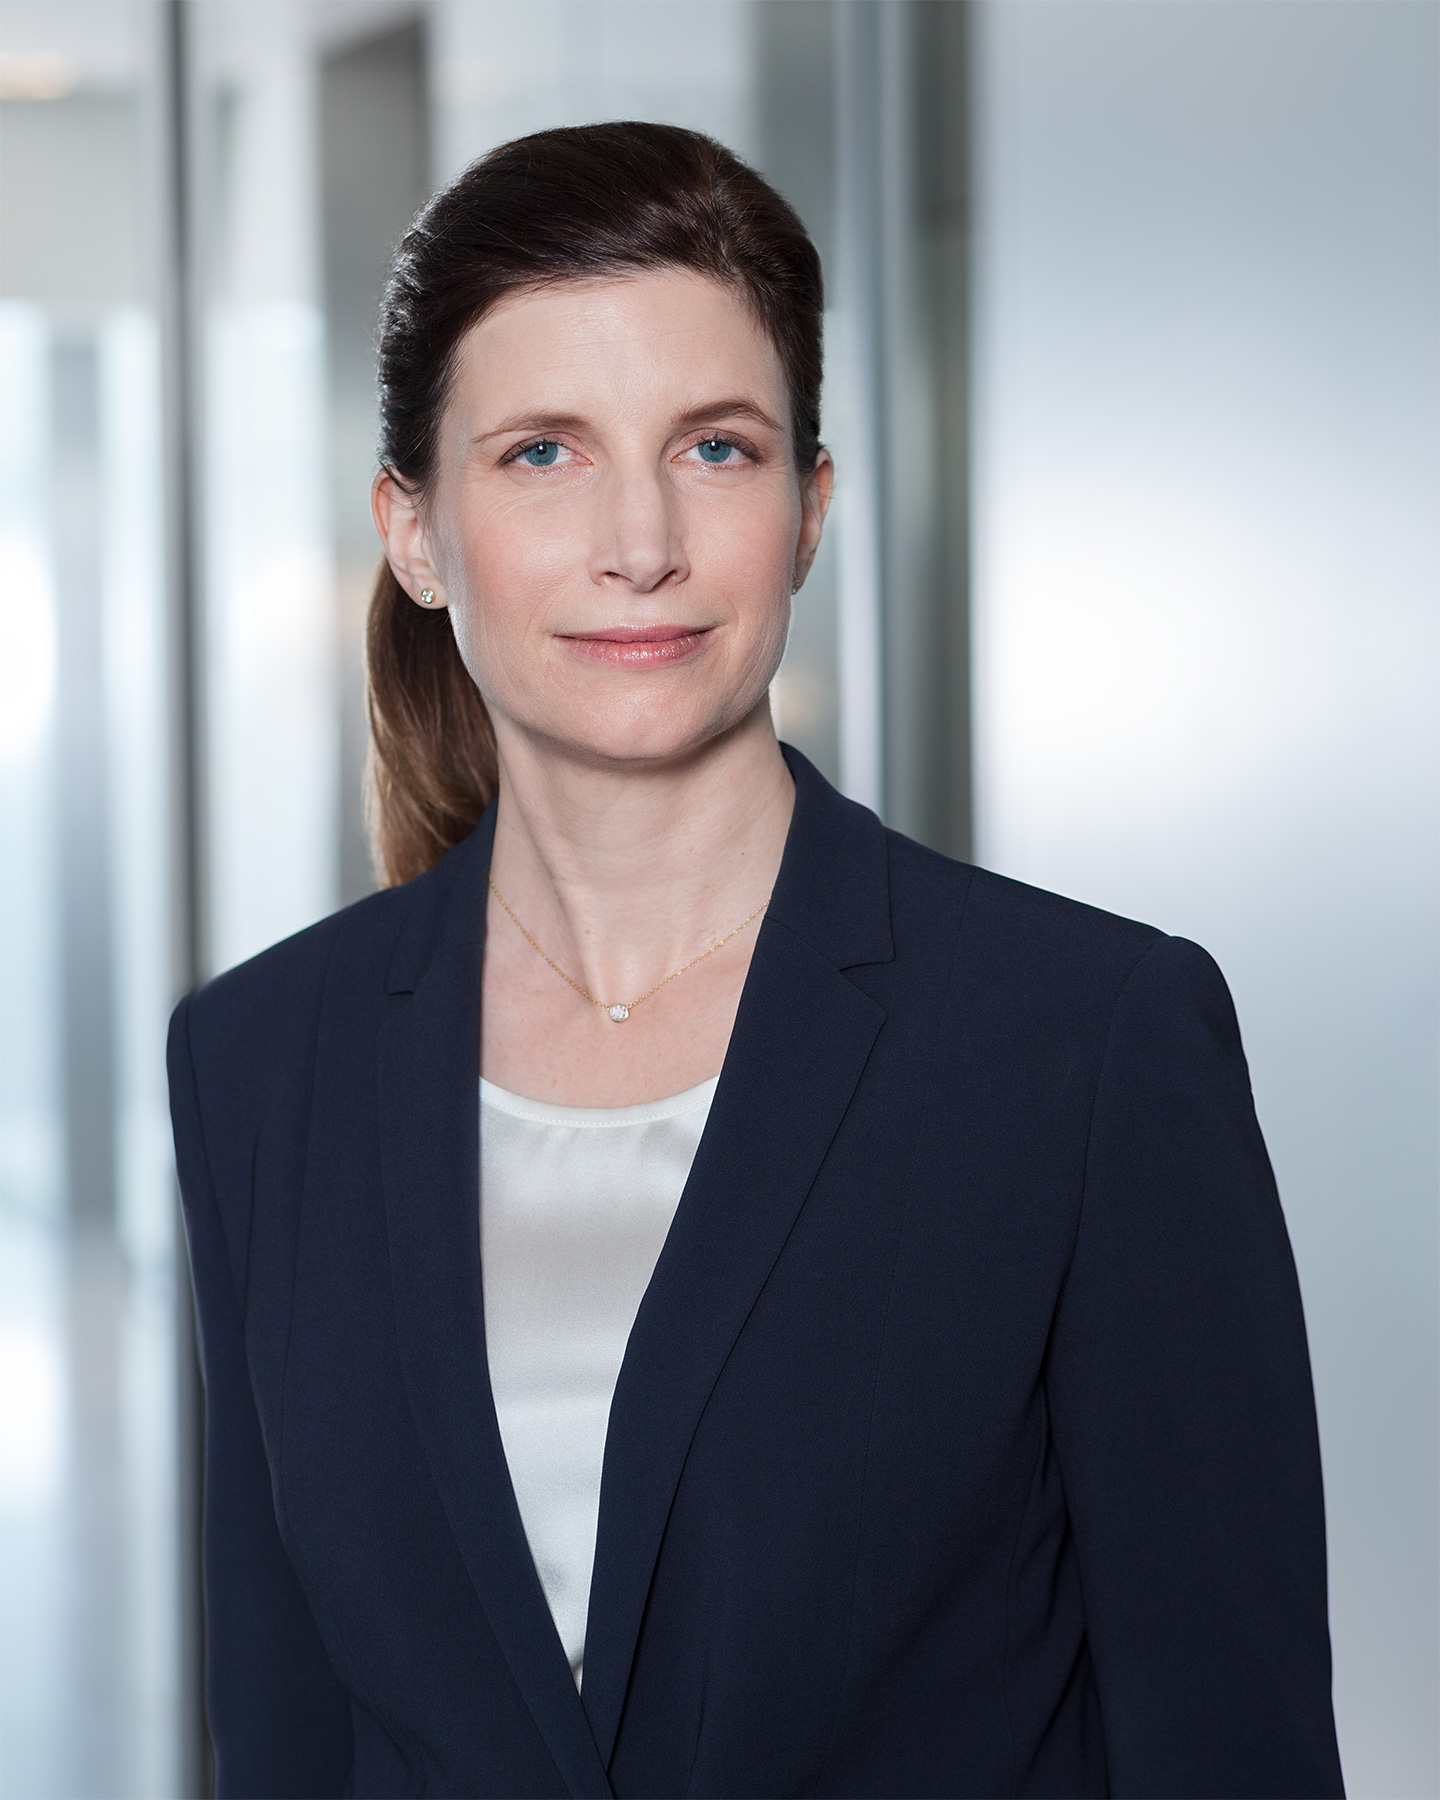 Businessfotografie CEO Portrait Corporate Photography